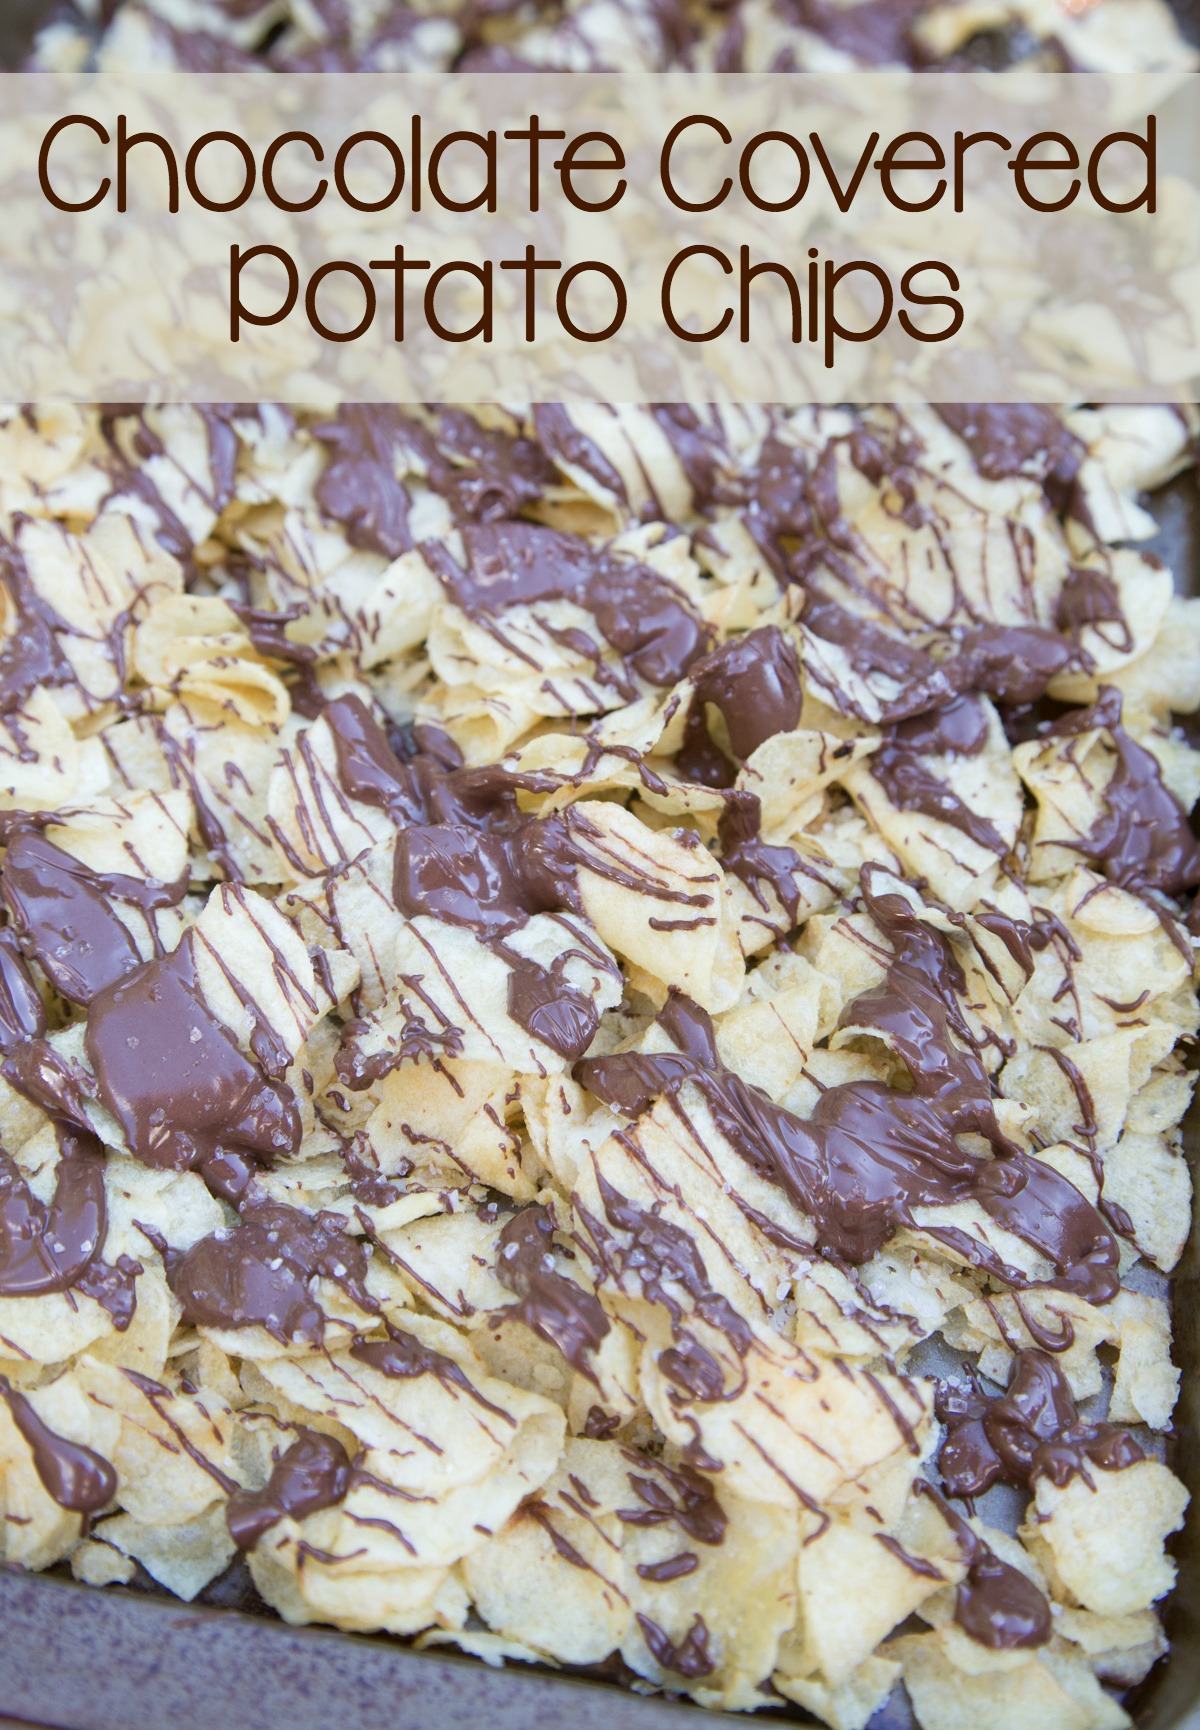 chocolate-covered-potato-chips-on-5dollardinners-com